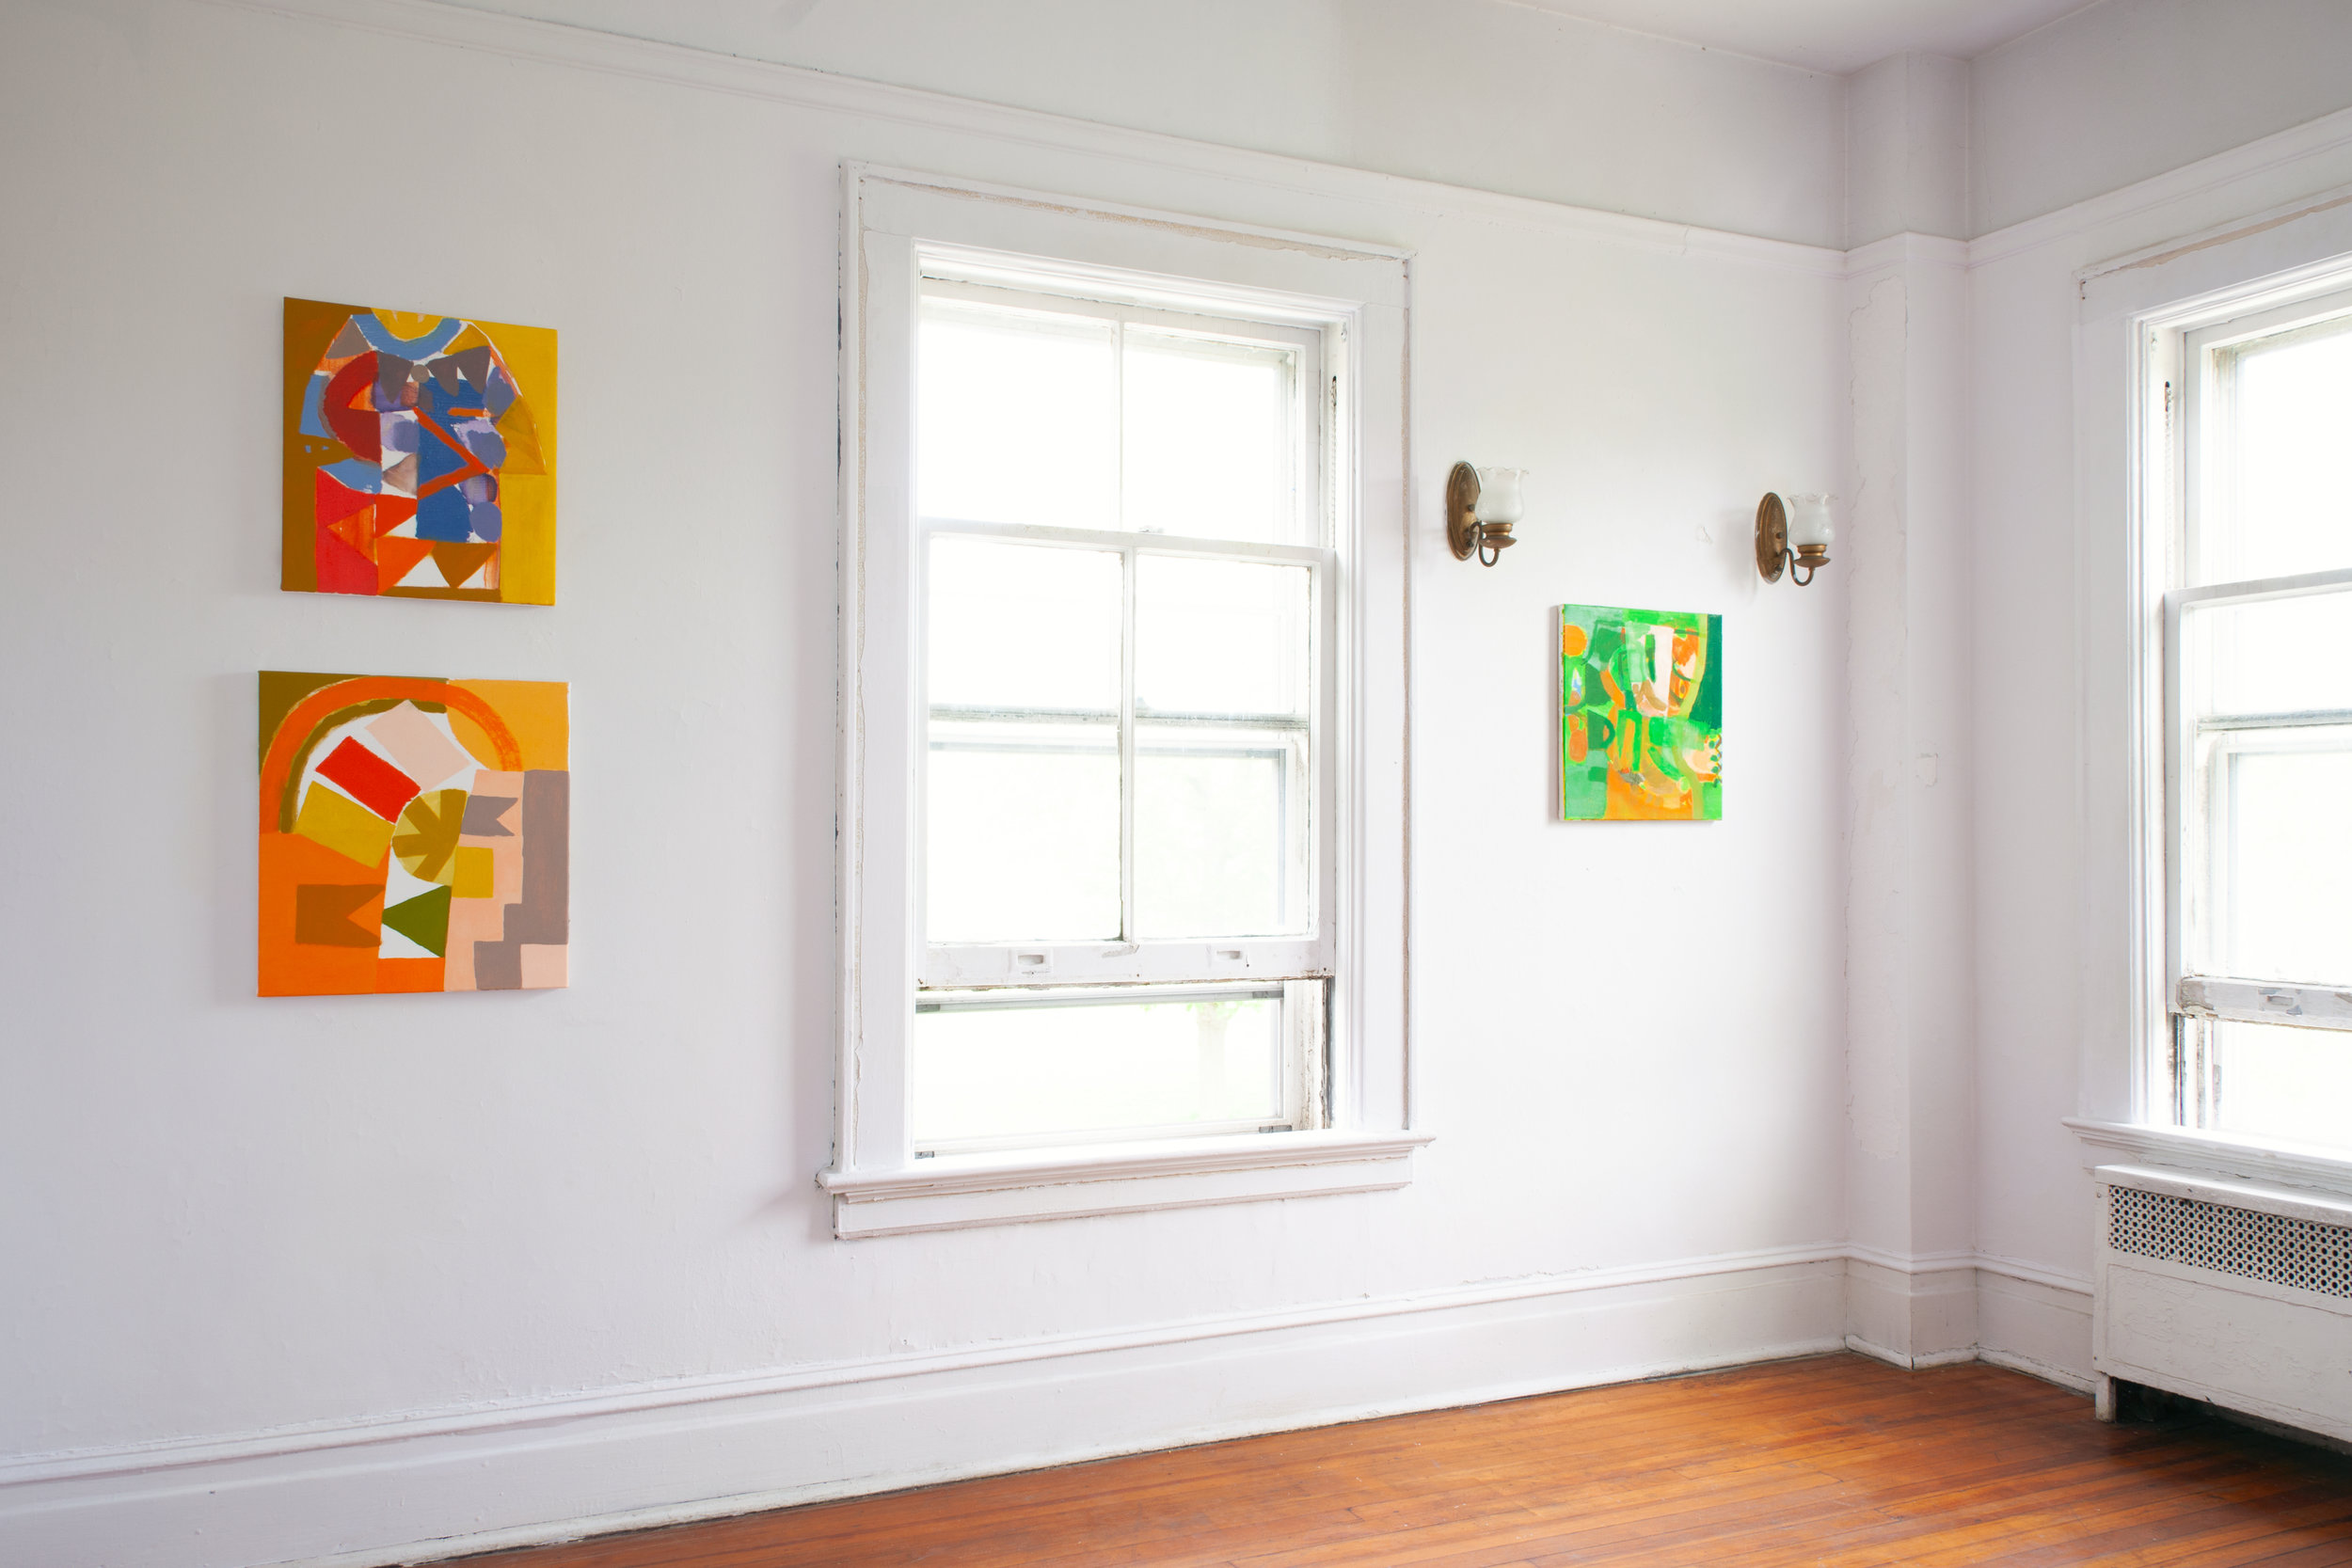 Meghan_Brady-NADA_House-2019-installation_view_12.jpg